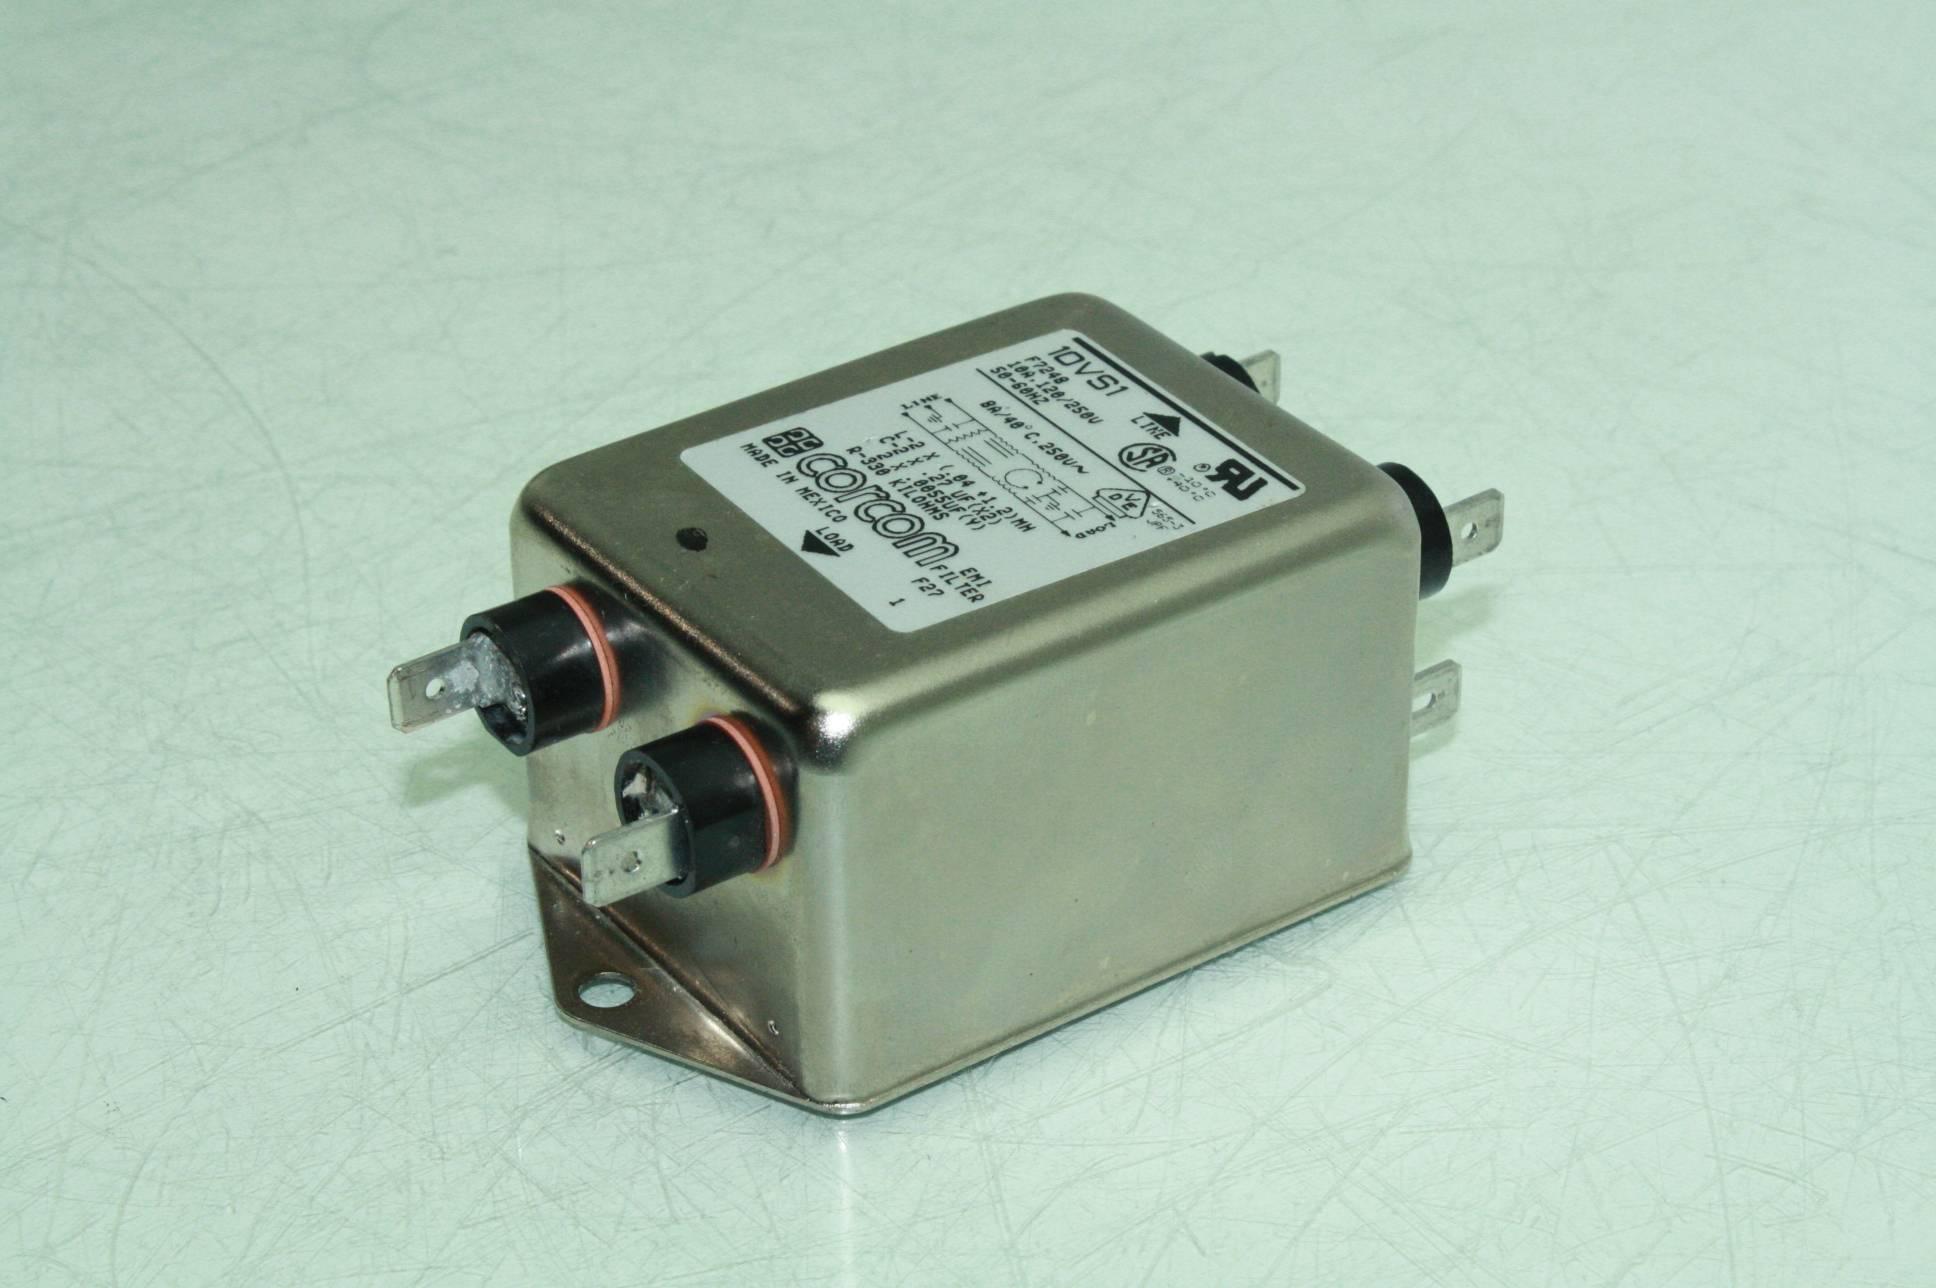 Corcom Emi Filter 10vs1 Single Phase Power Line Filter 120  250v    10 Amps